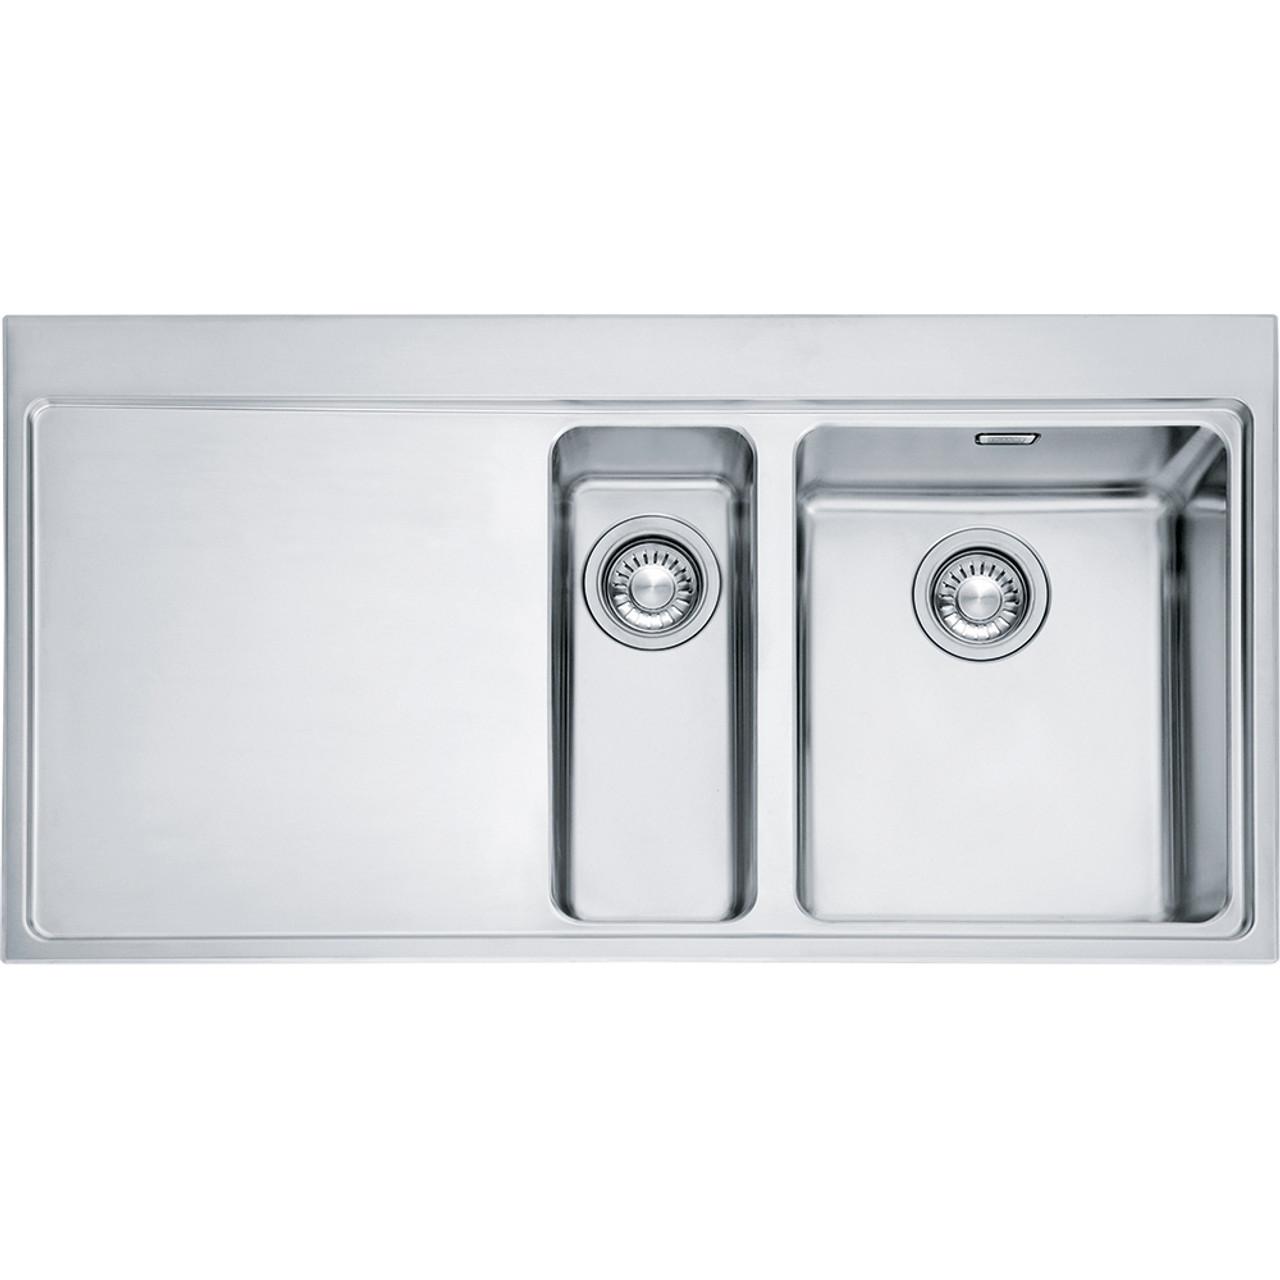 Franke mythos mmx251 stainless steel kitchen sink sinks - Kitchen sinks stainless ...